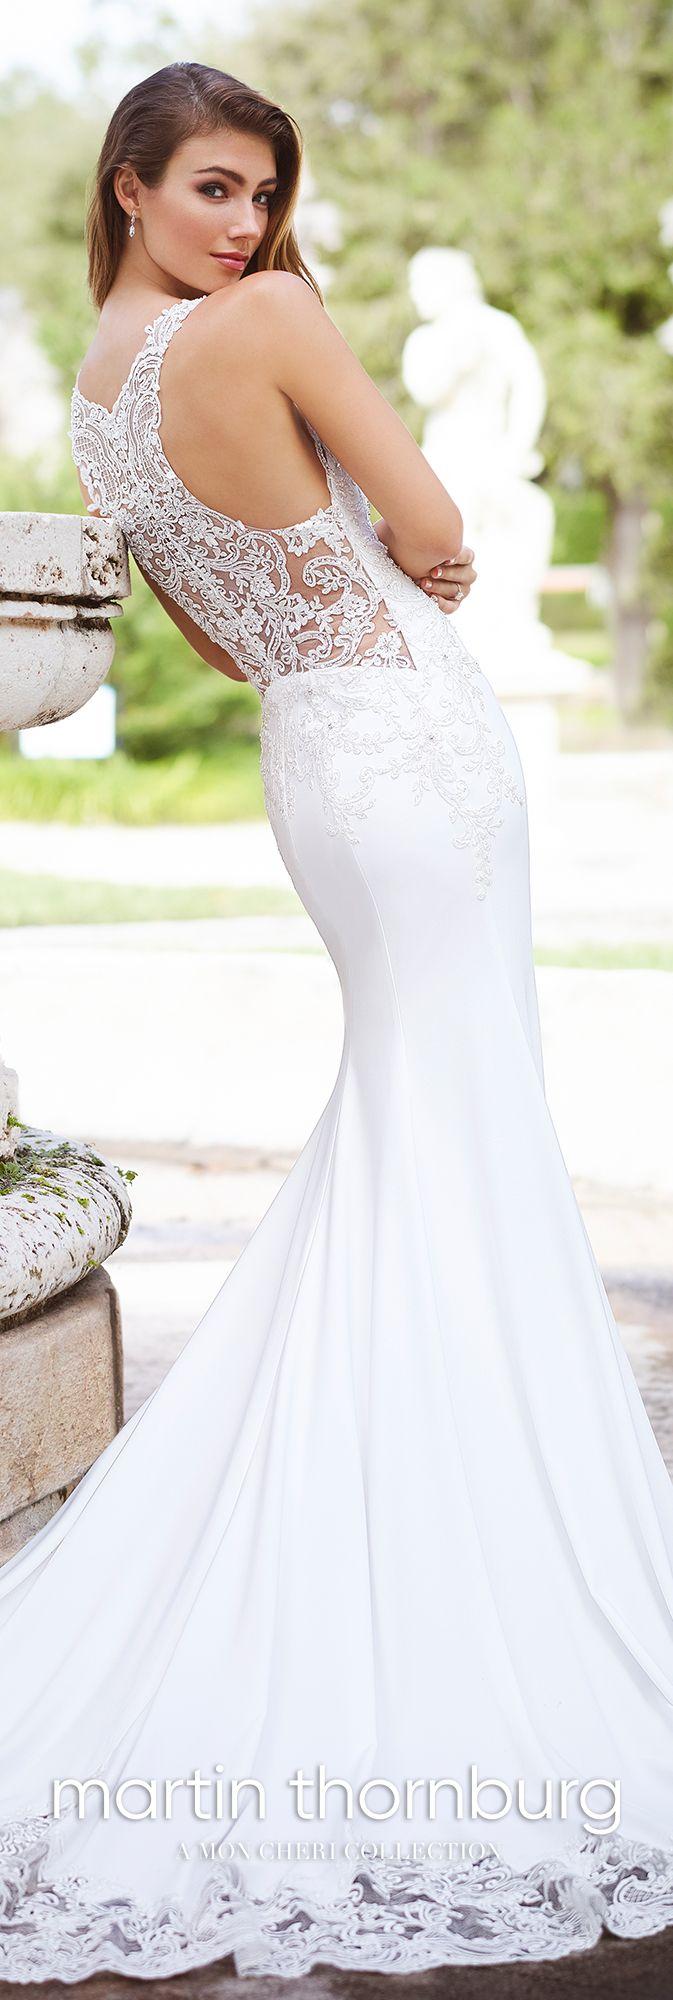 Sleeveless lace high neck crepe fit u flare wedding dress martin